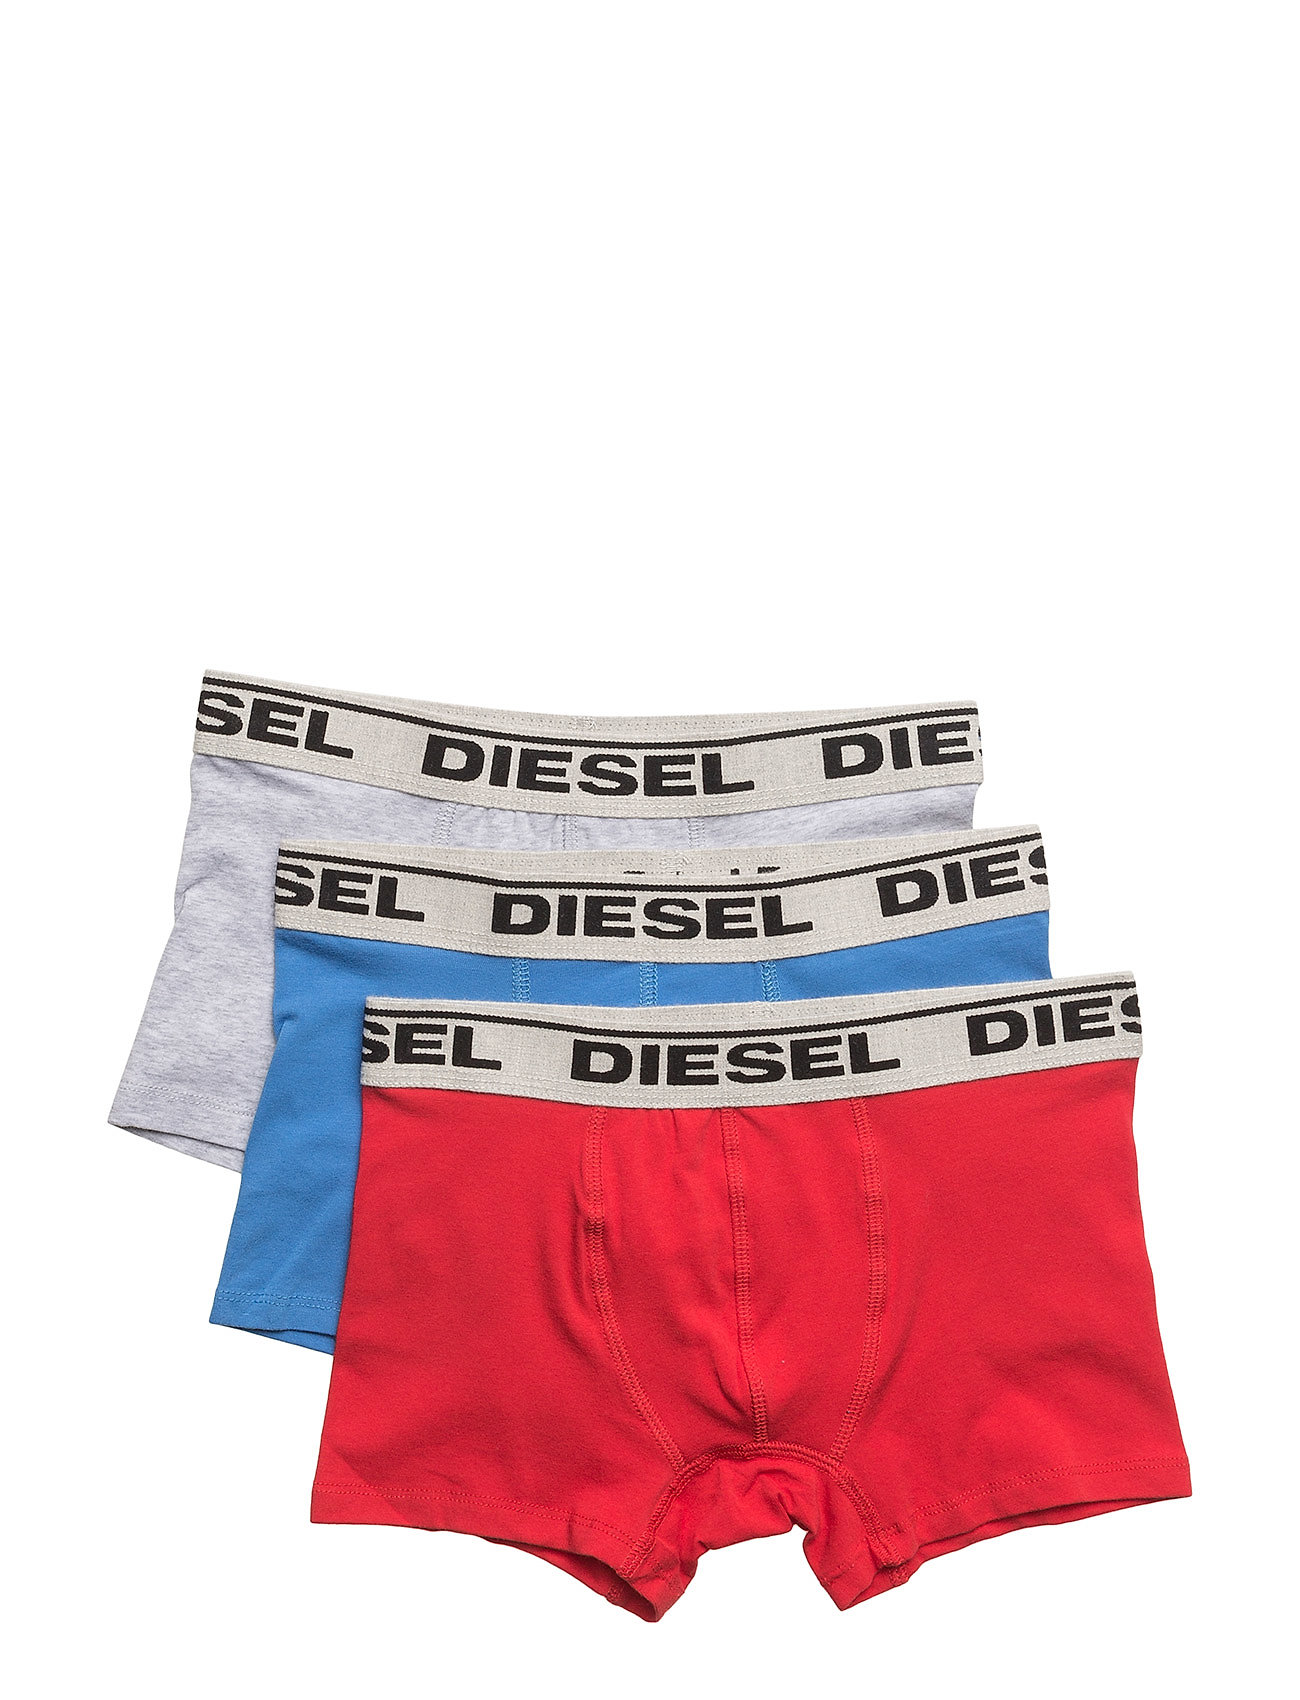 25d9e28c1dc BLUETTE+BLACK+WHITE Diesel Ugov Three-Pack Us Boxer -Shorts ...